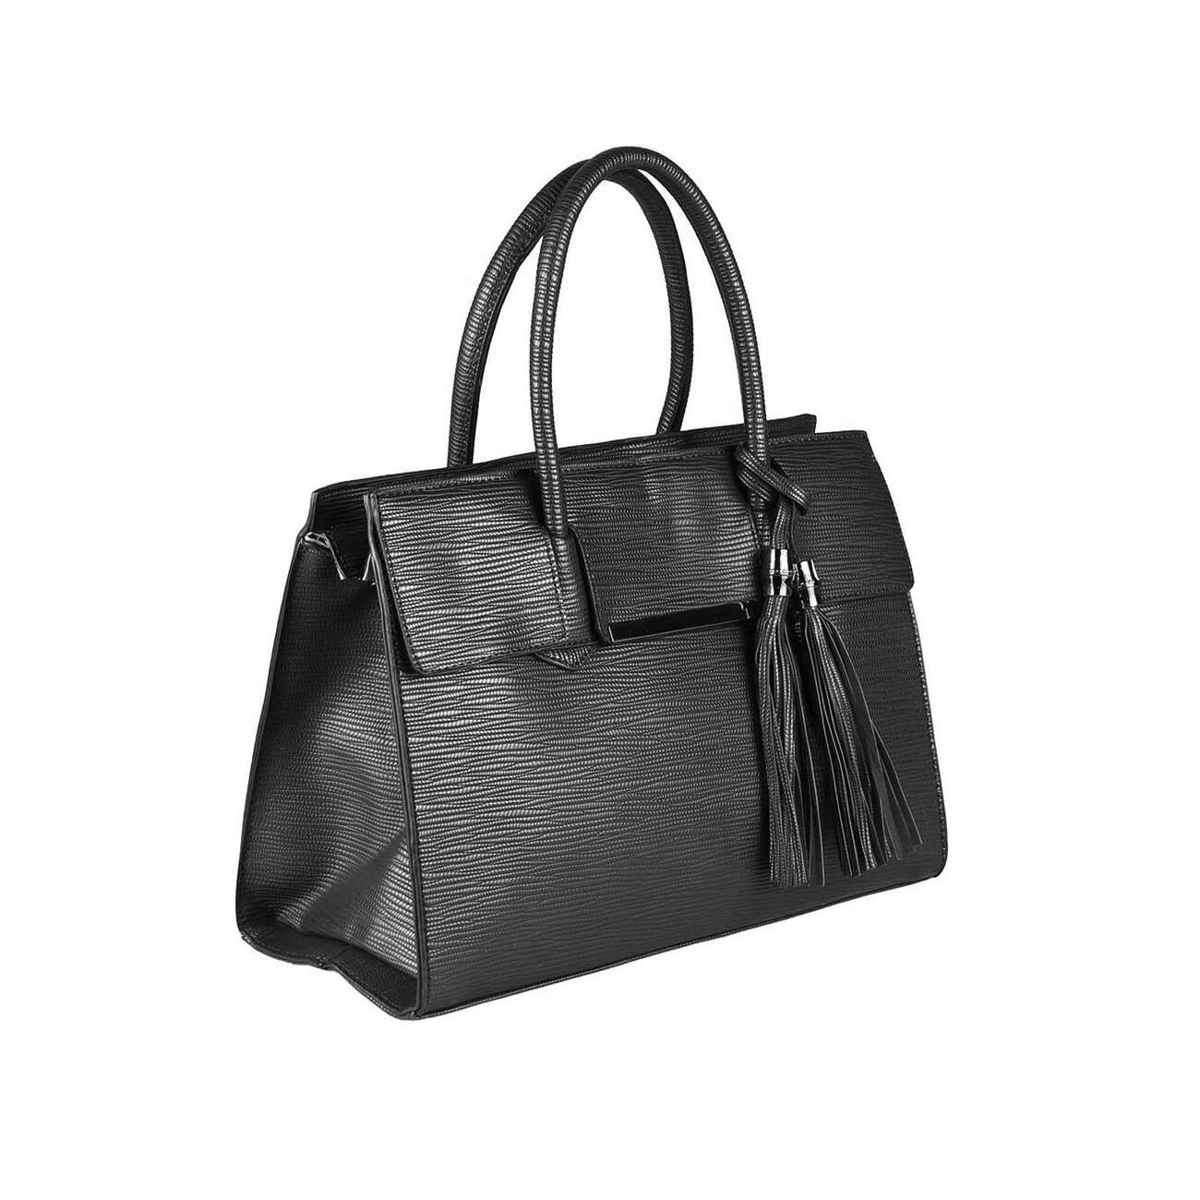 obc damen business tasche handtasche shopper schultertasche umh ngetasche henkeltasche workbag. Black Bedroom Furniture Sets. Home Design Ideas